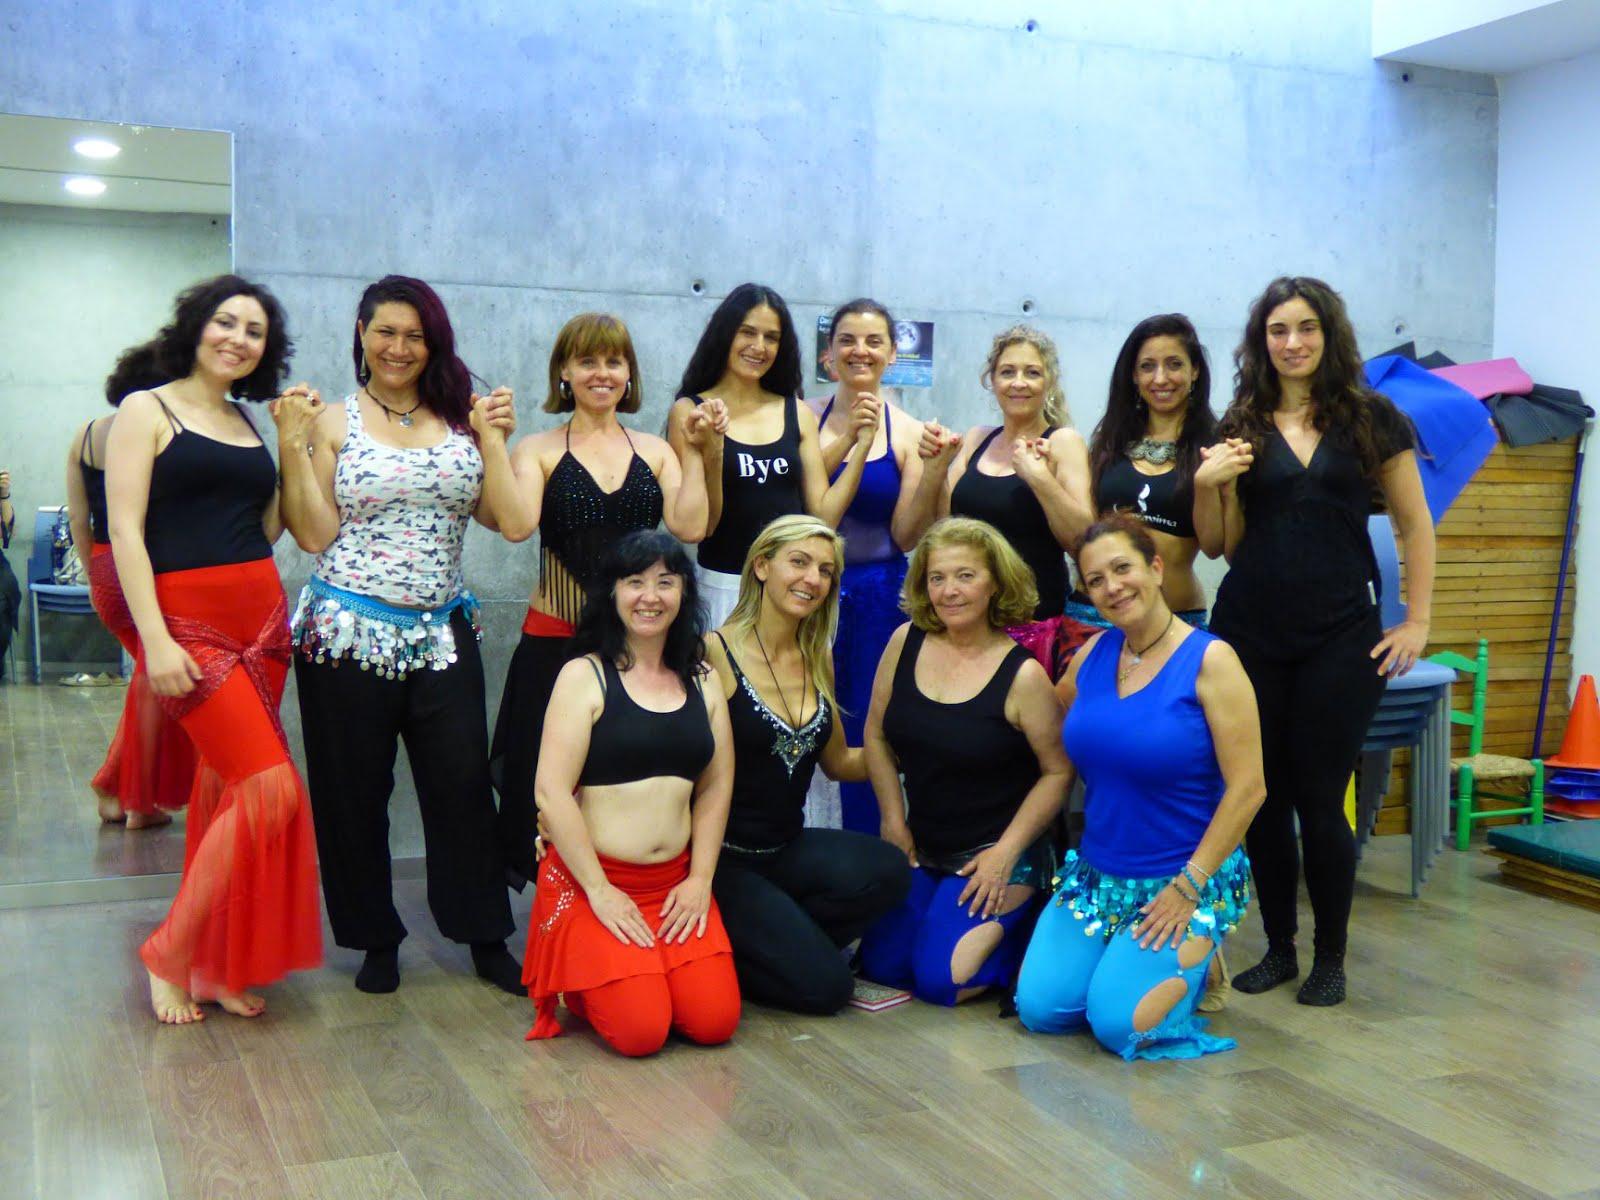 NAjmarabic en Talleres Semana de la Danza de Danzavima 2018